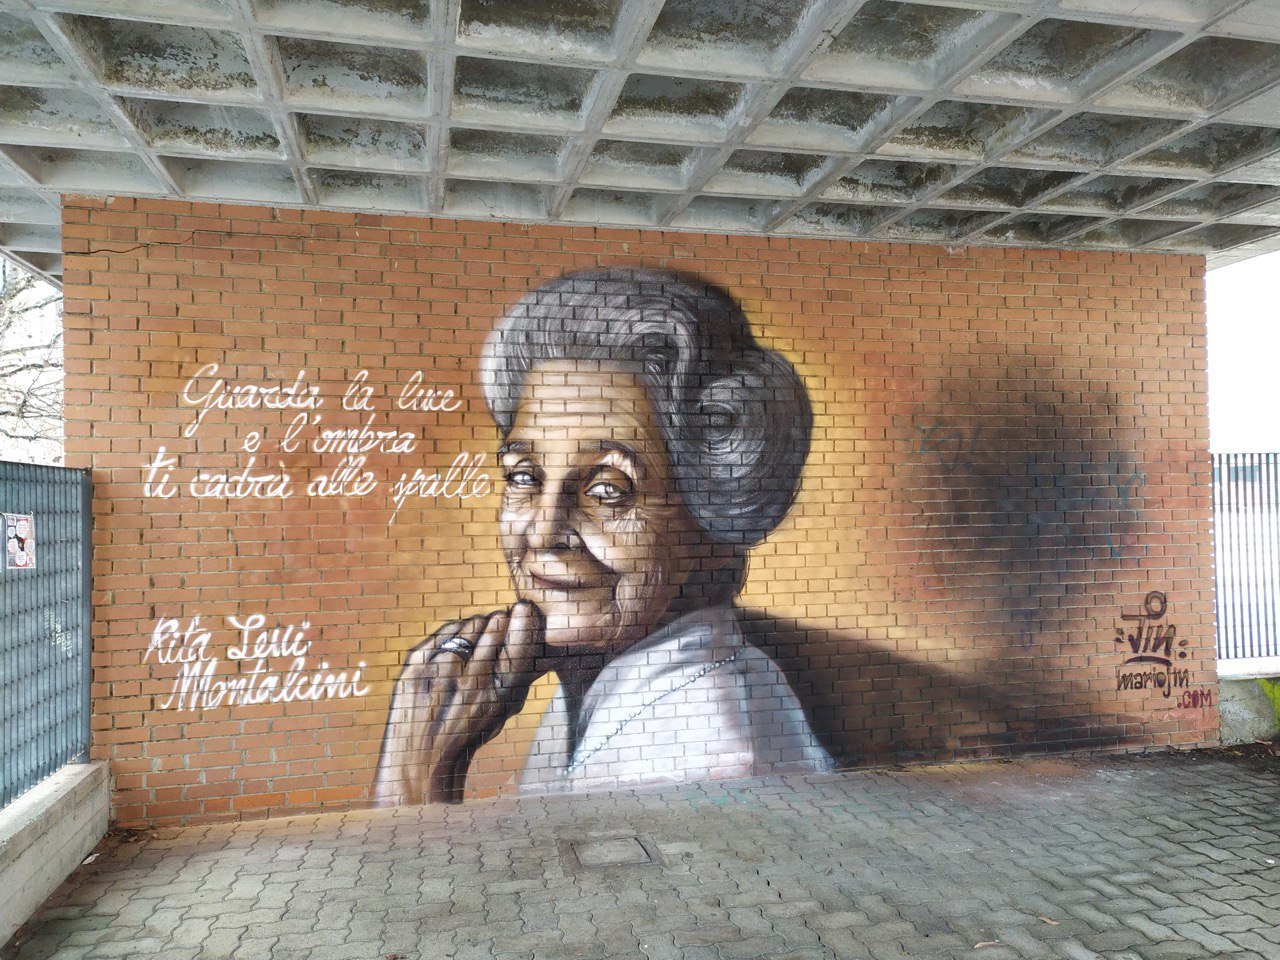 Rita Levi Montalcini – Quartieri a colori pt.2